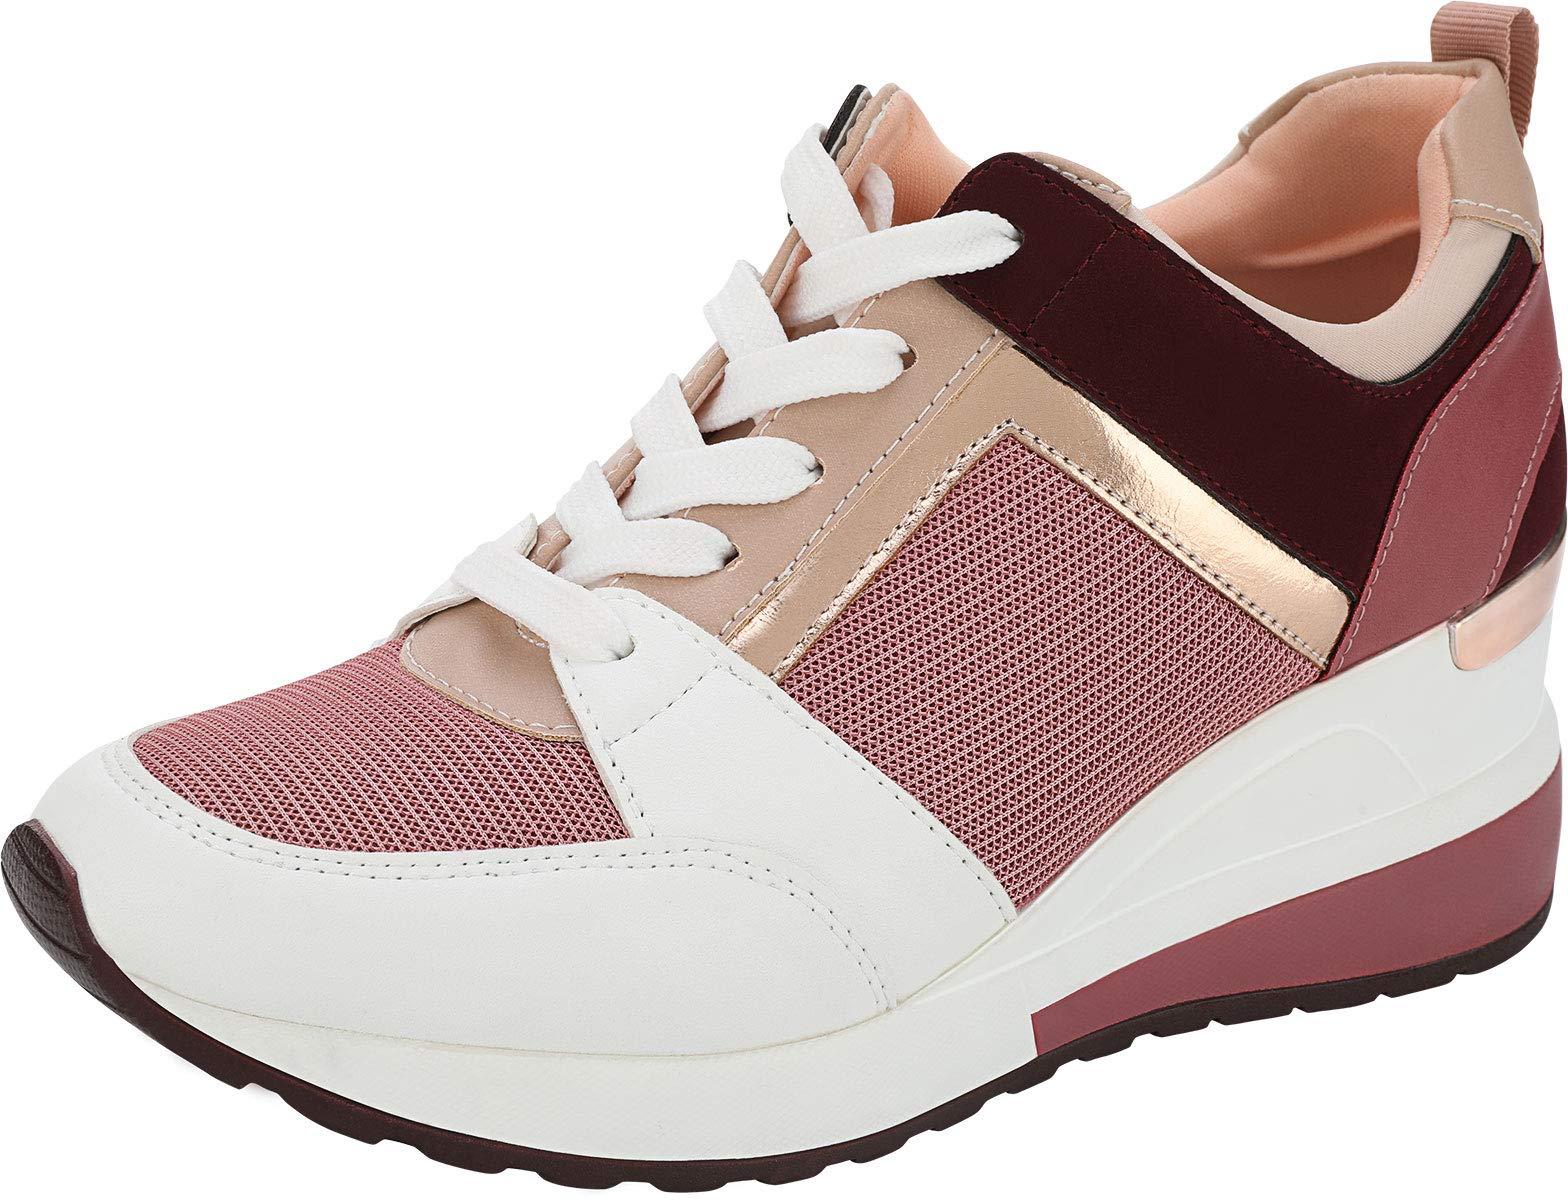 Yolanda Zula Women's Hidden Wedge Sneakers High Heel Fashion Lightweight Walking Shoes Pink, 5